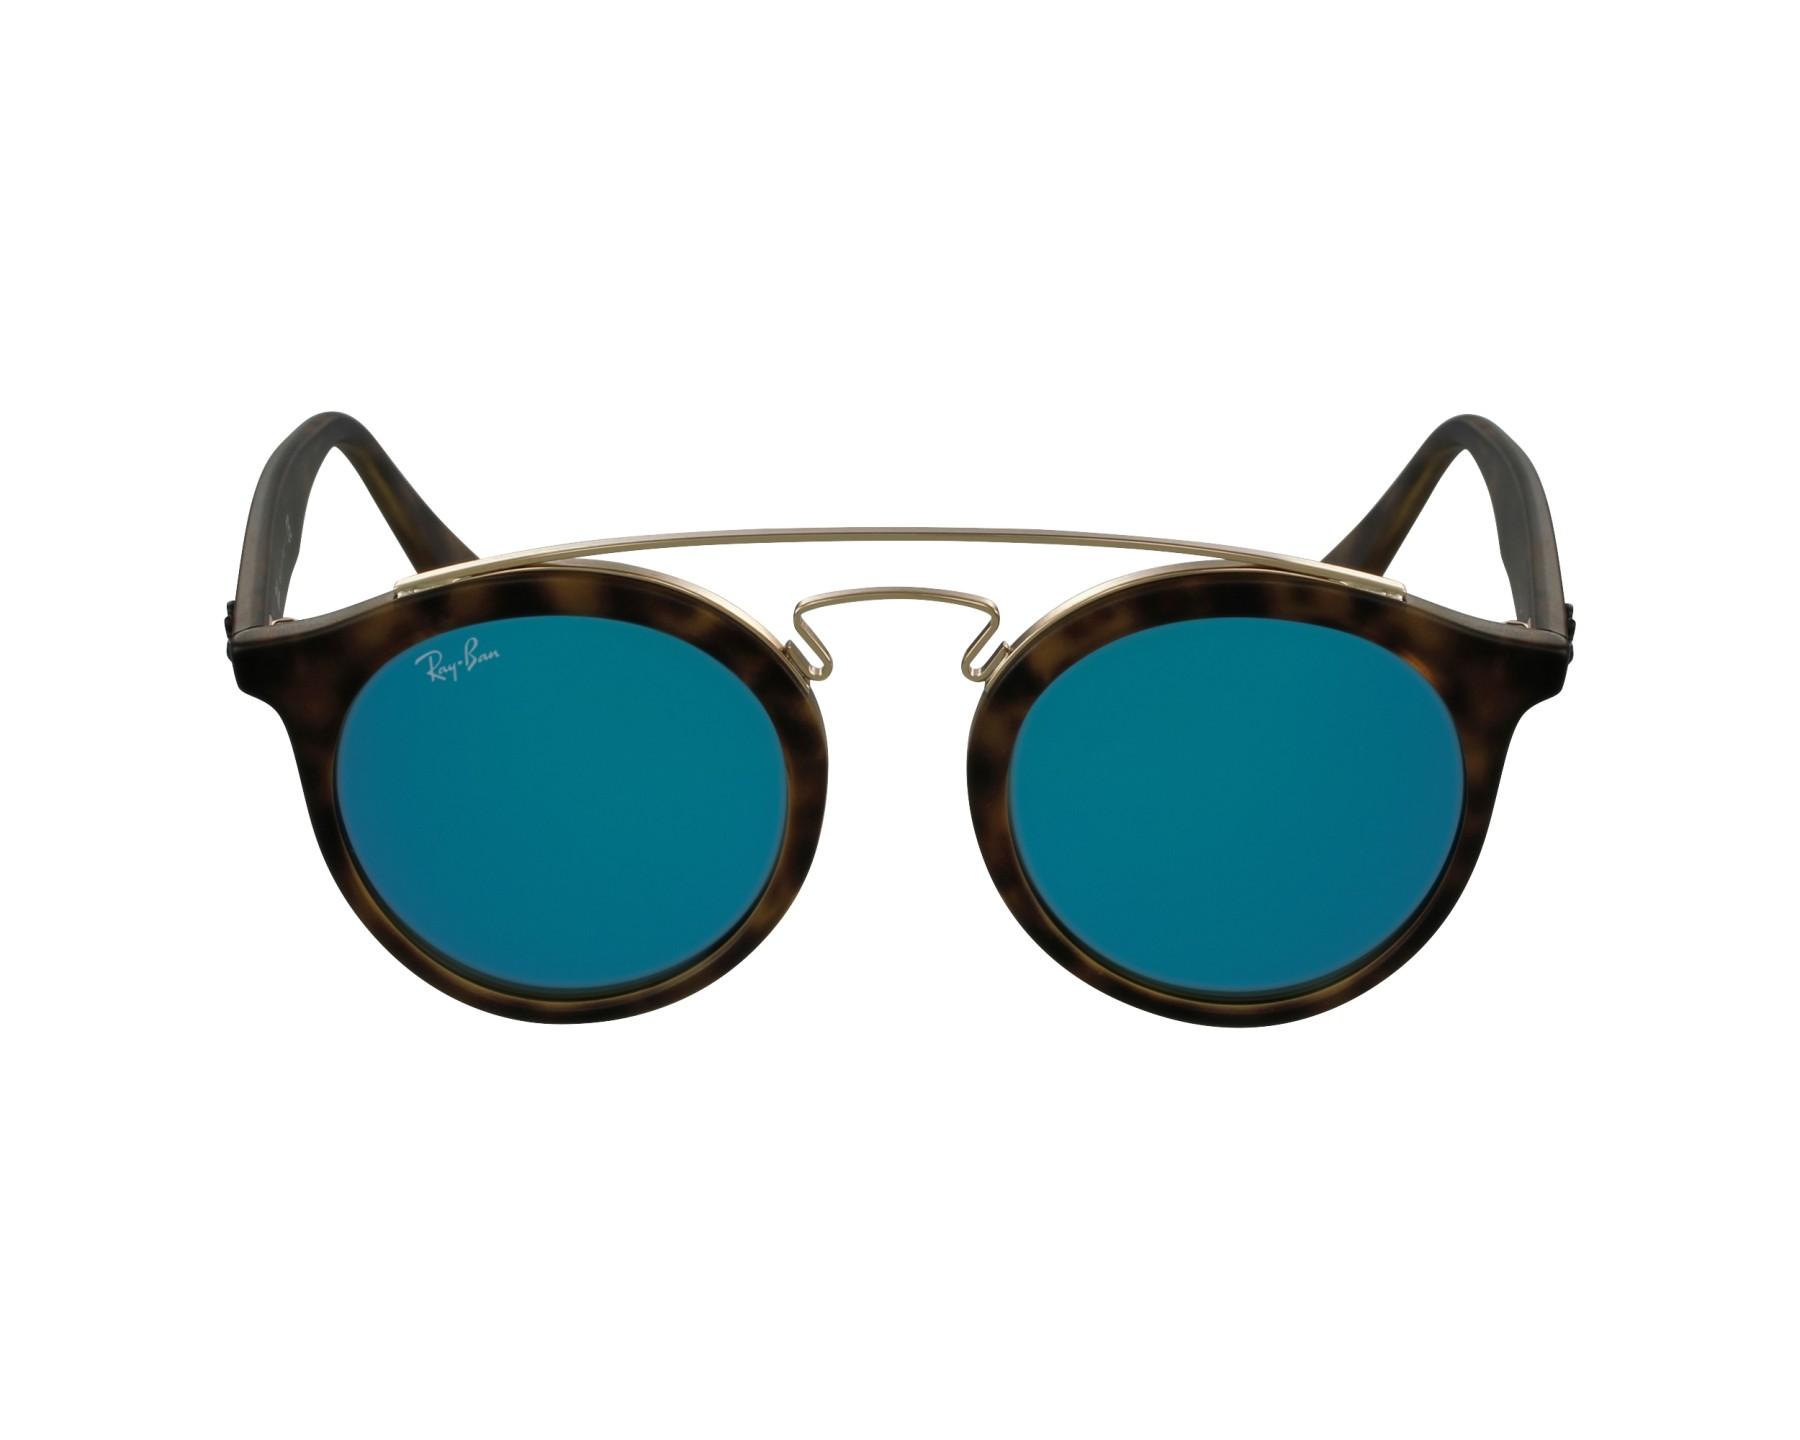 92596311fd thumbnail Sunglasses Ray-Ban RB-4256 6092 55 - Havana Gold profile view